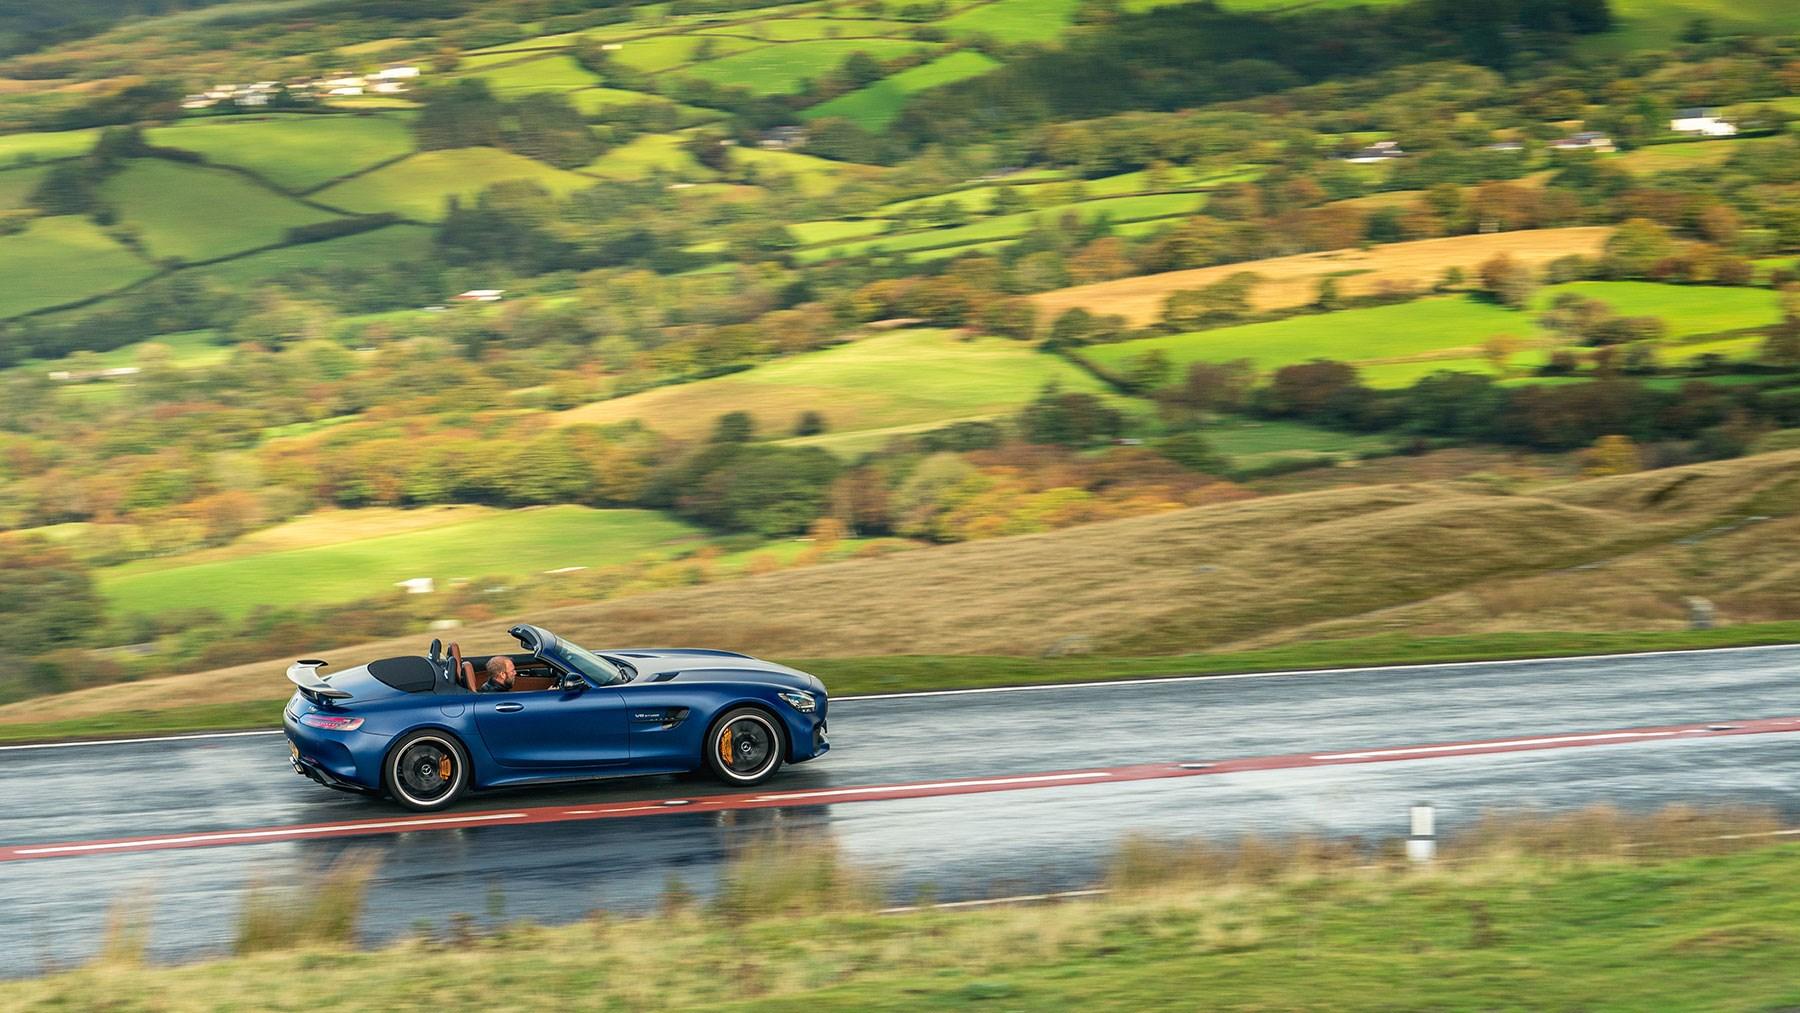 Mercedes-AMG GT R Roadster specs